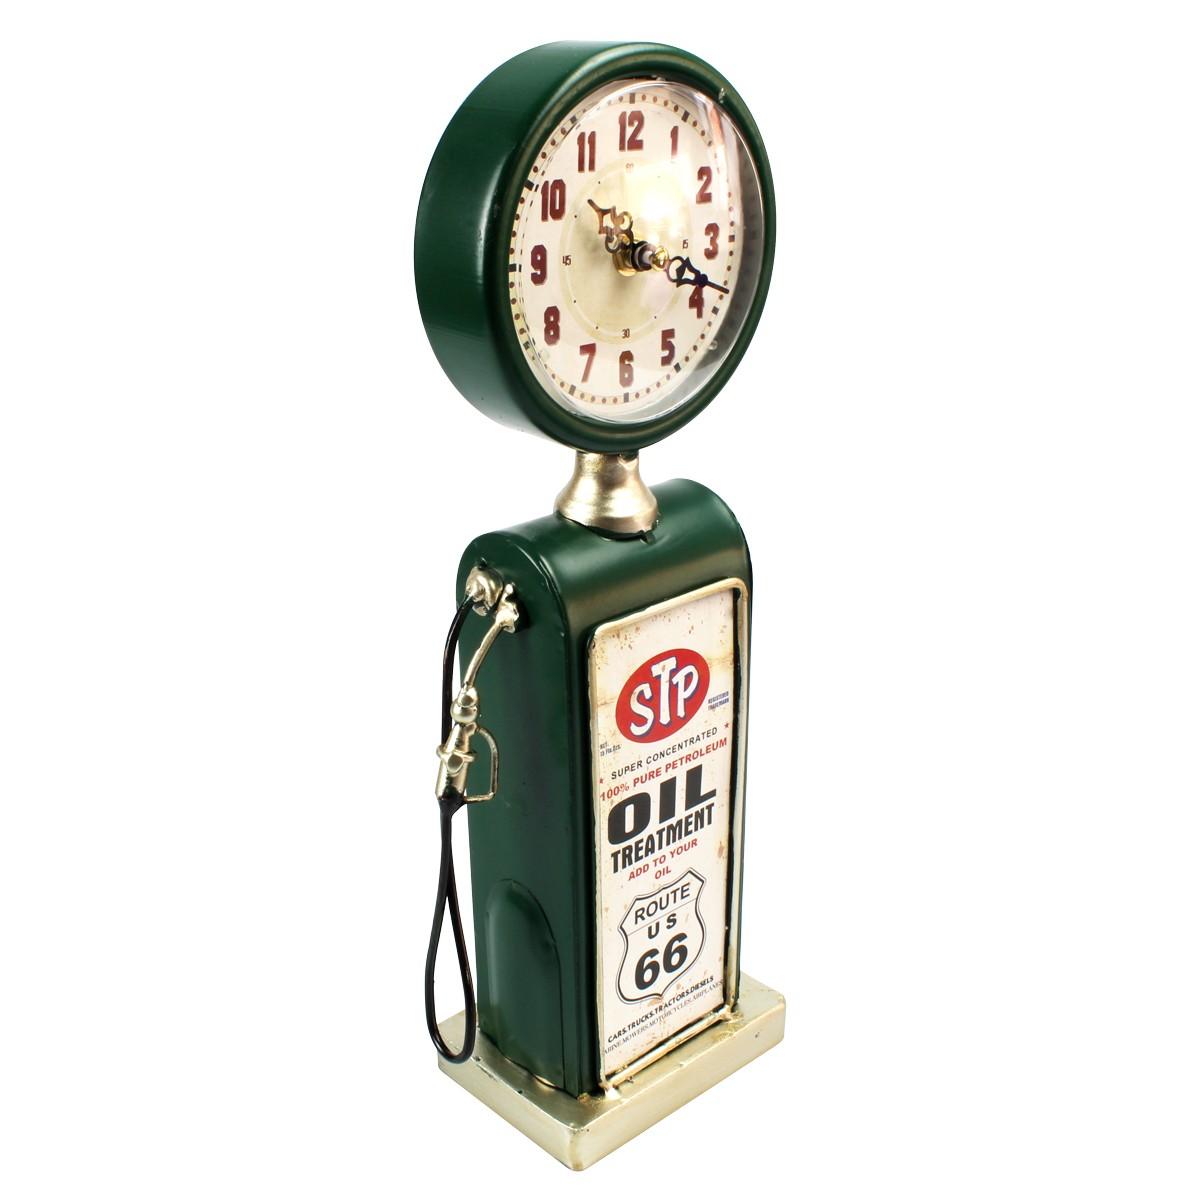 Relógio De Mesa Bomba De Gasolina Oil Treatment Route 66 Verde